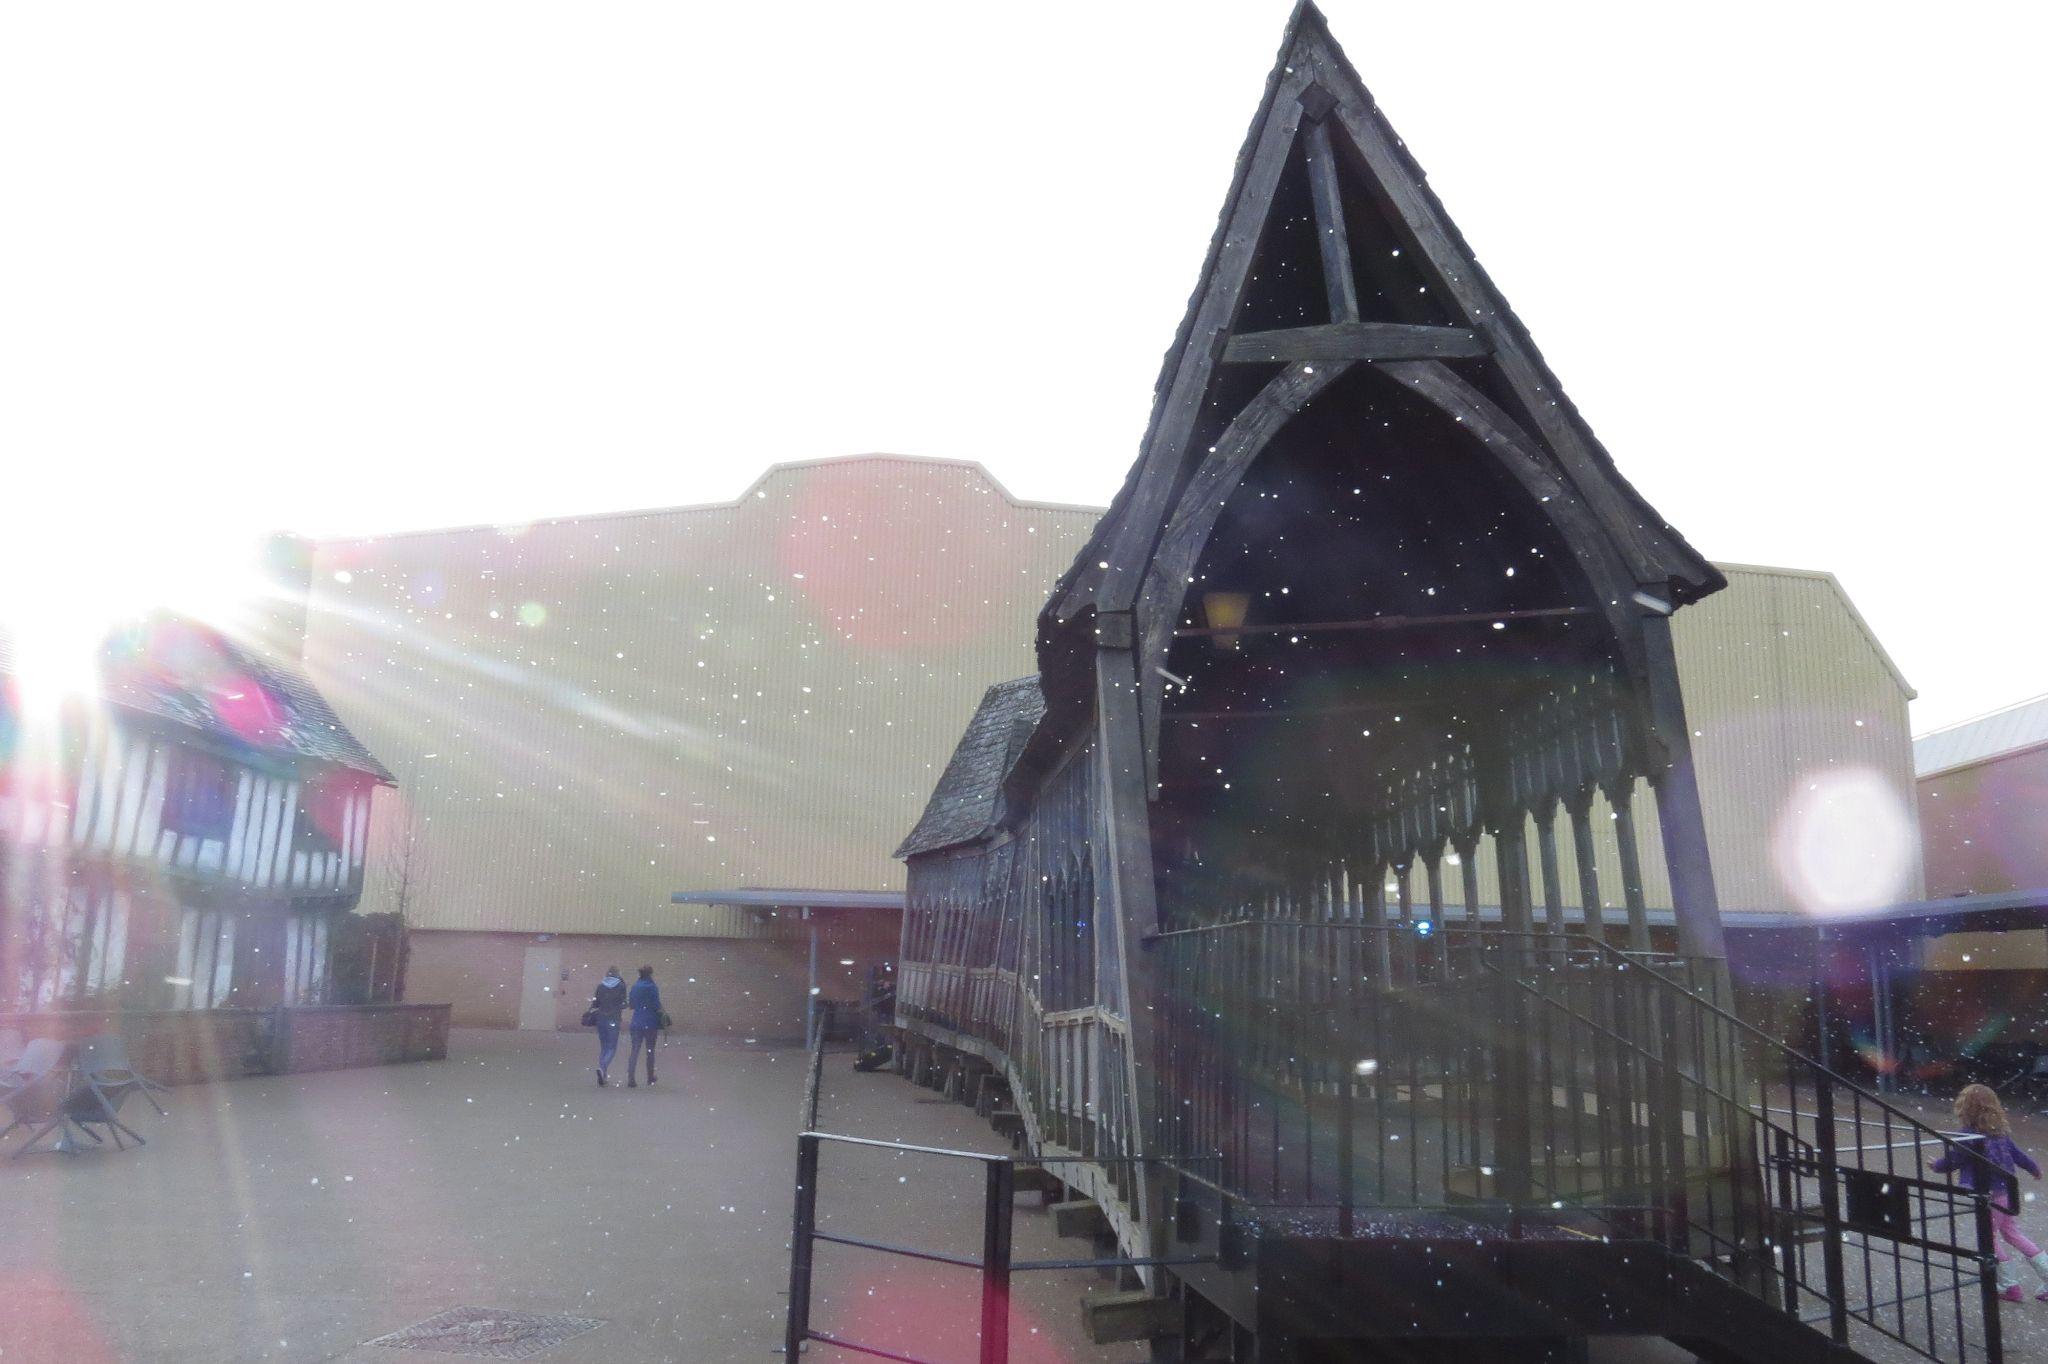 Studio Warner Harry Potter by Bulle2a